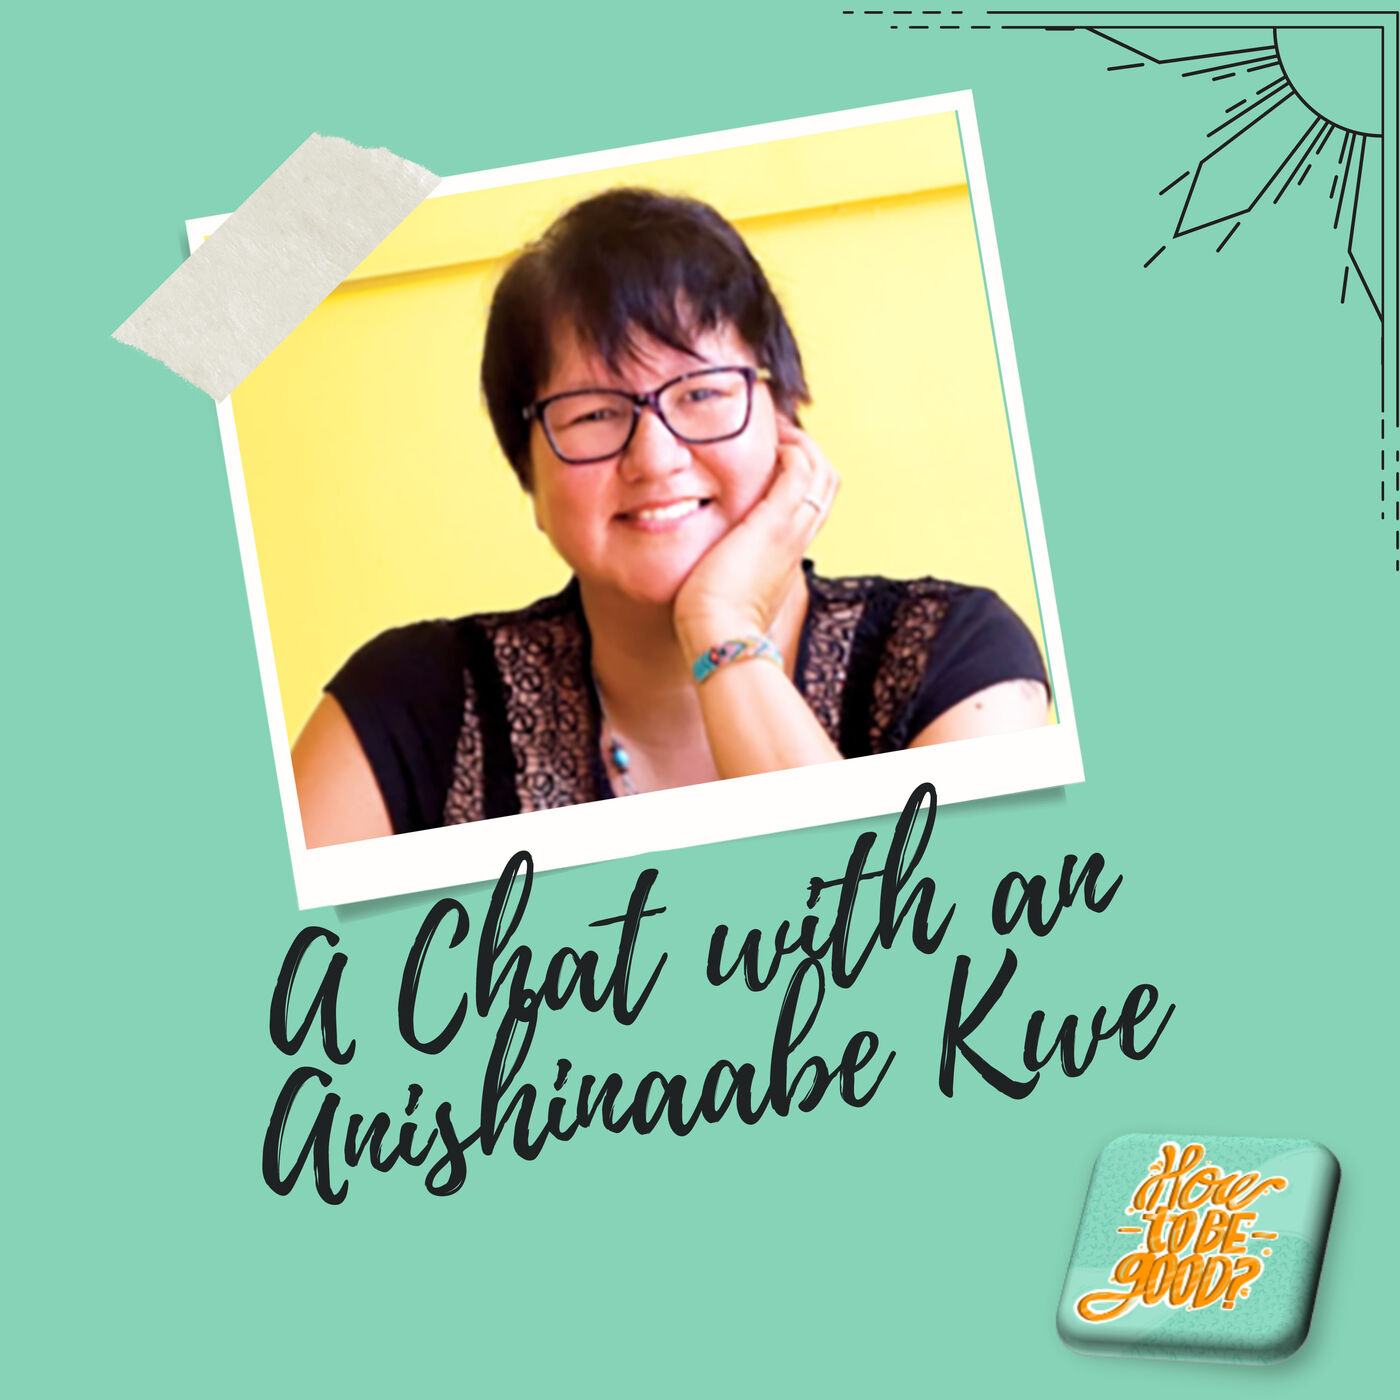 A chat with an Anishinaabe Kwe (Ojibway Woman)